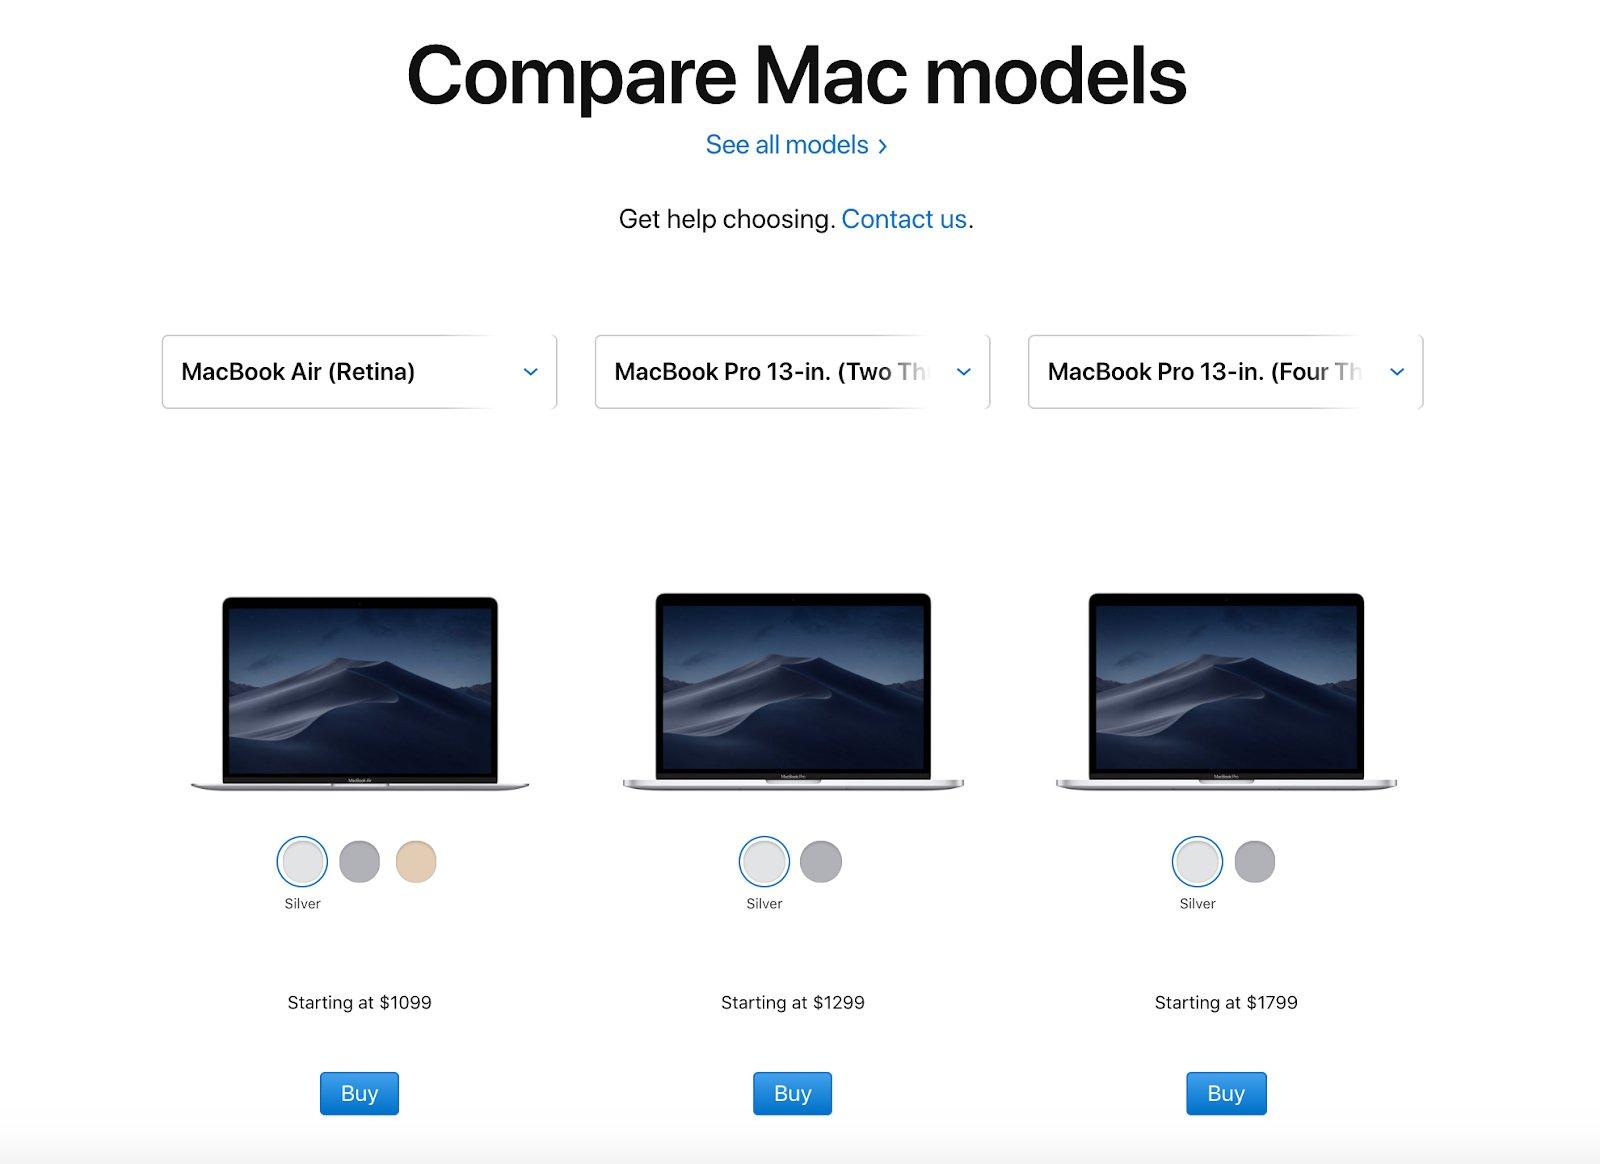 product comparison of Apple mac models